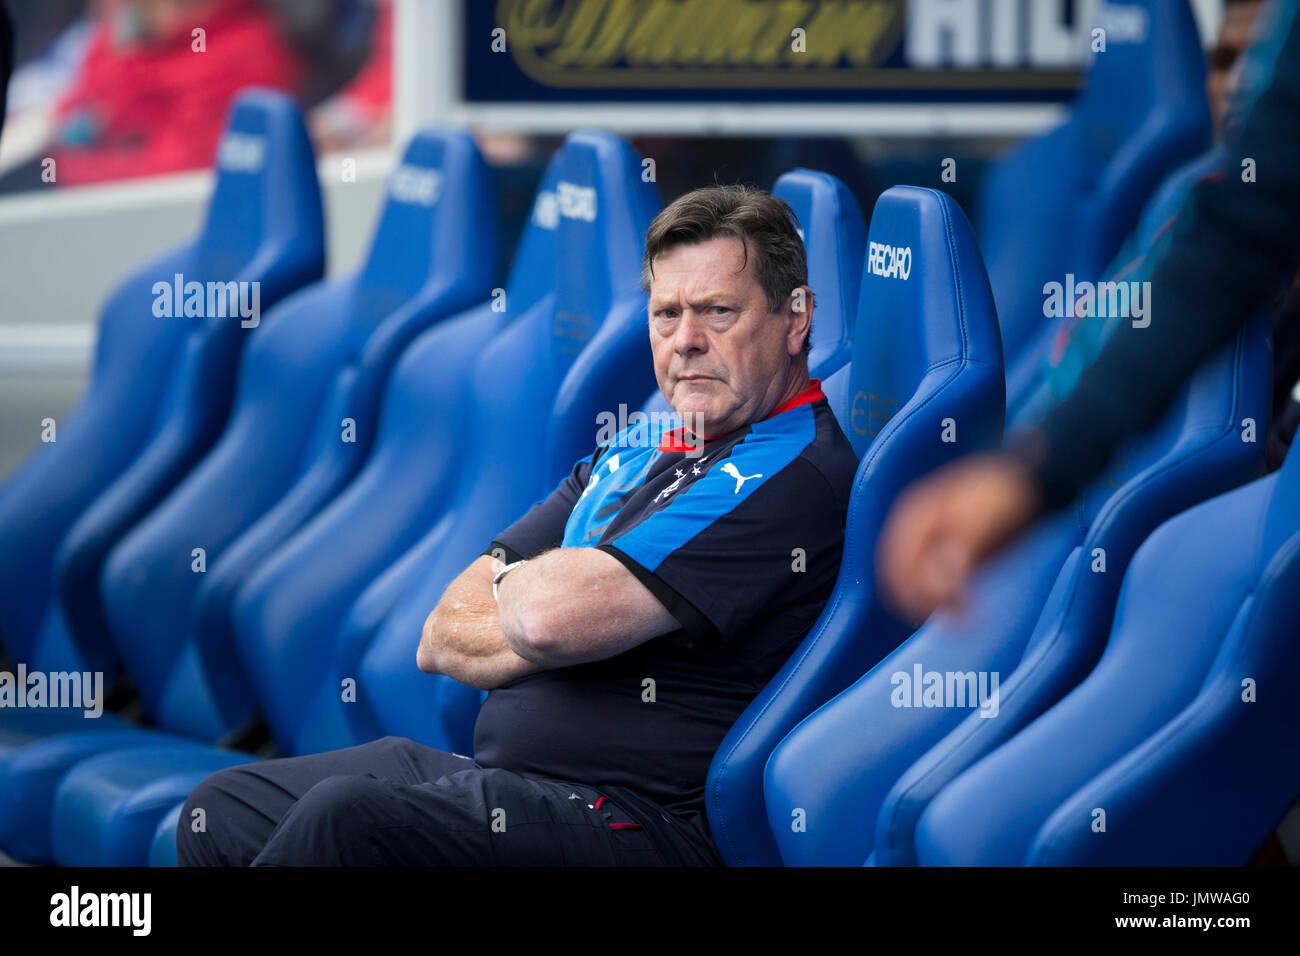 Rangers kit man Jimmy bell Stock Photo: 150533152 - Alamy